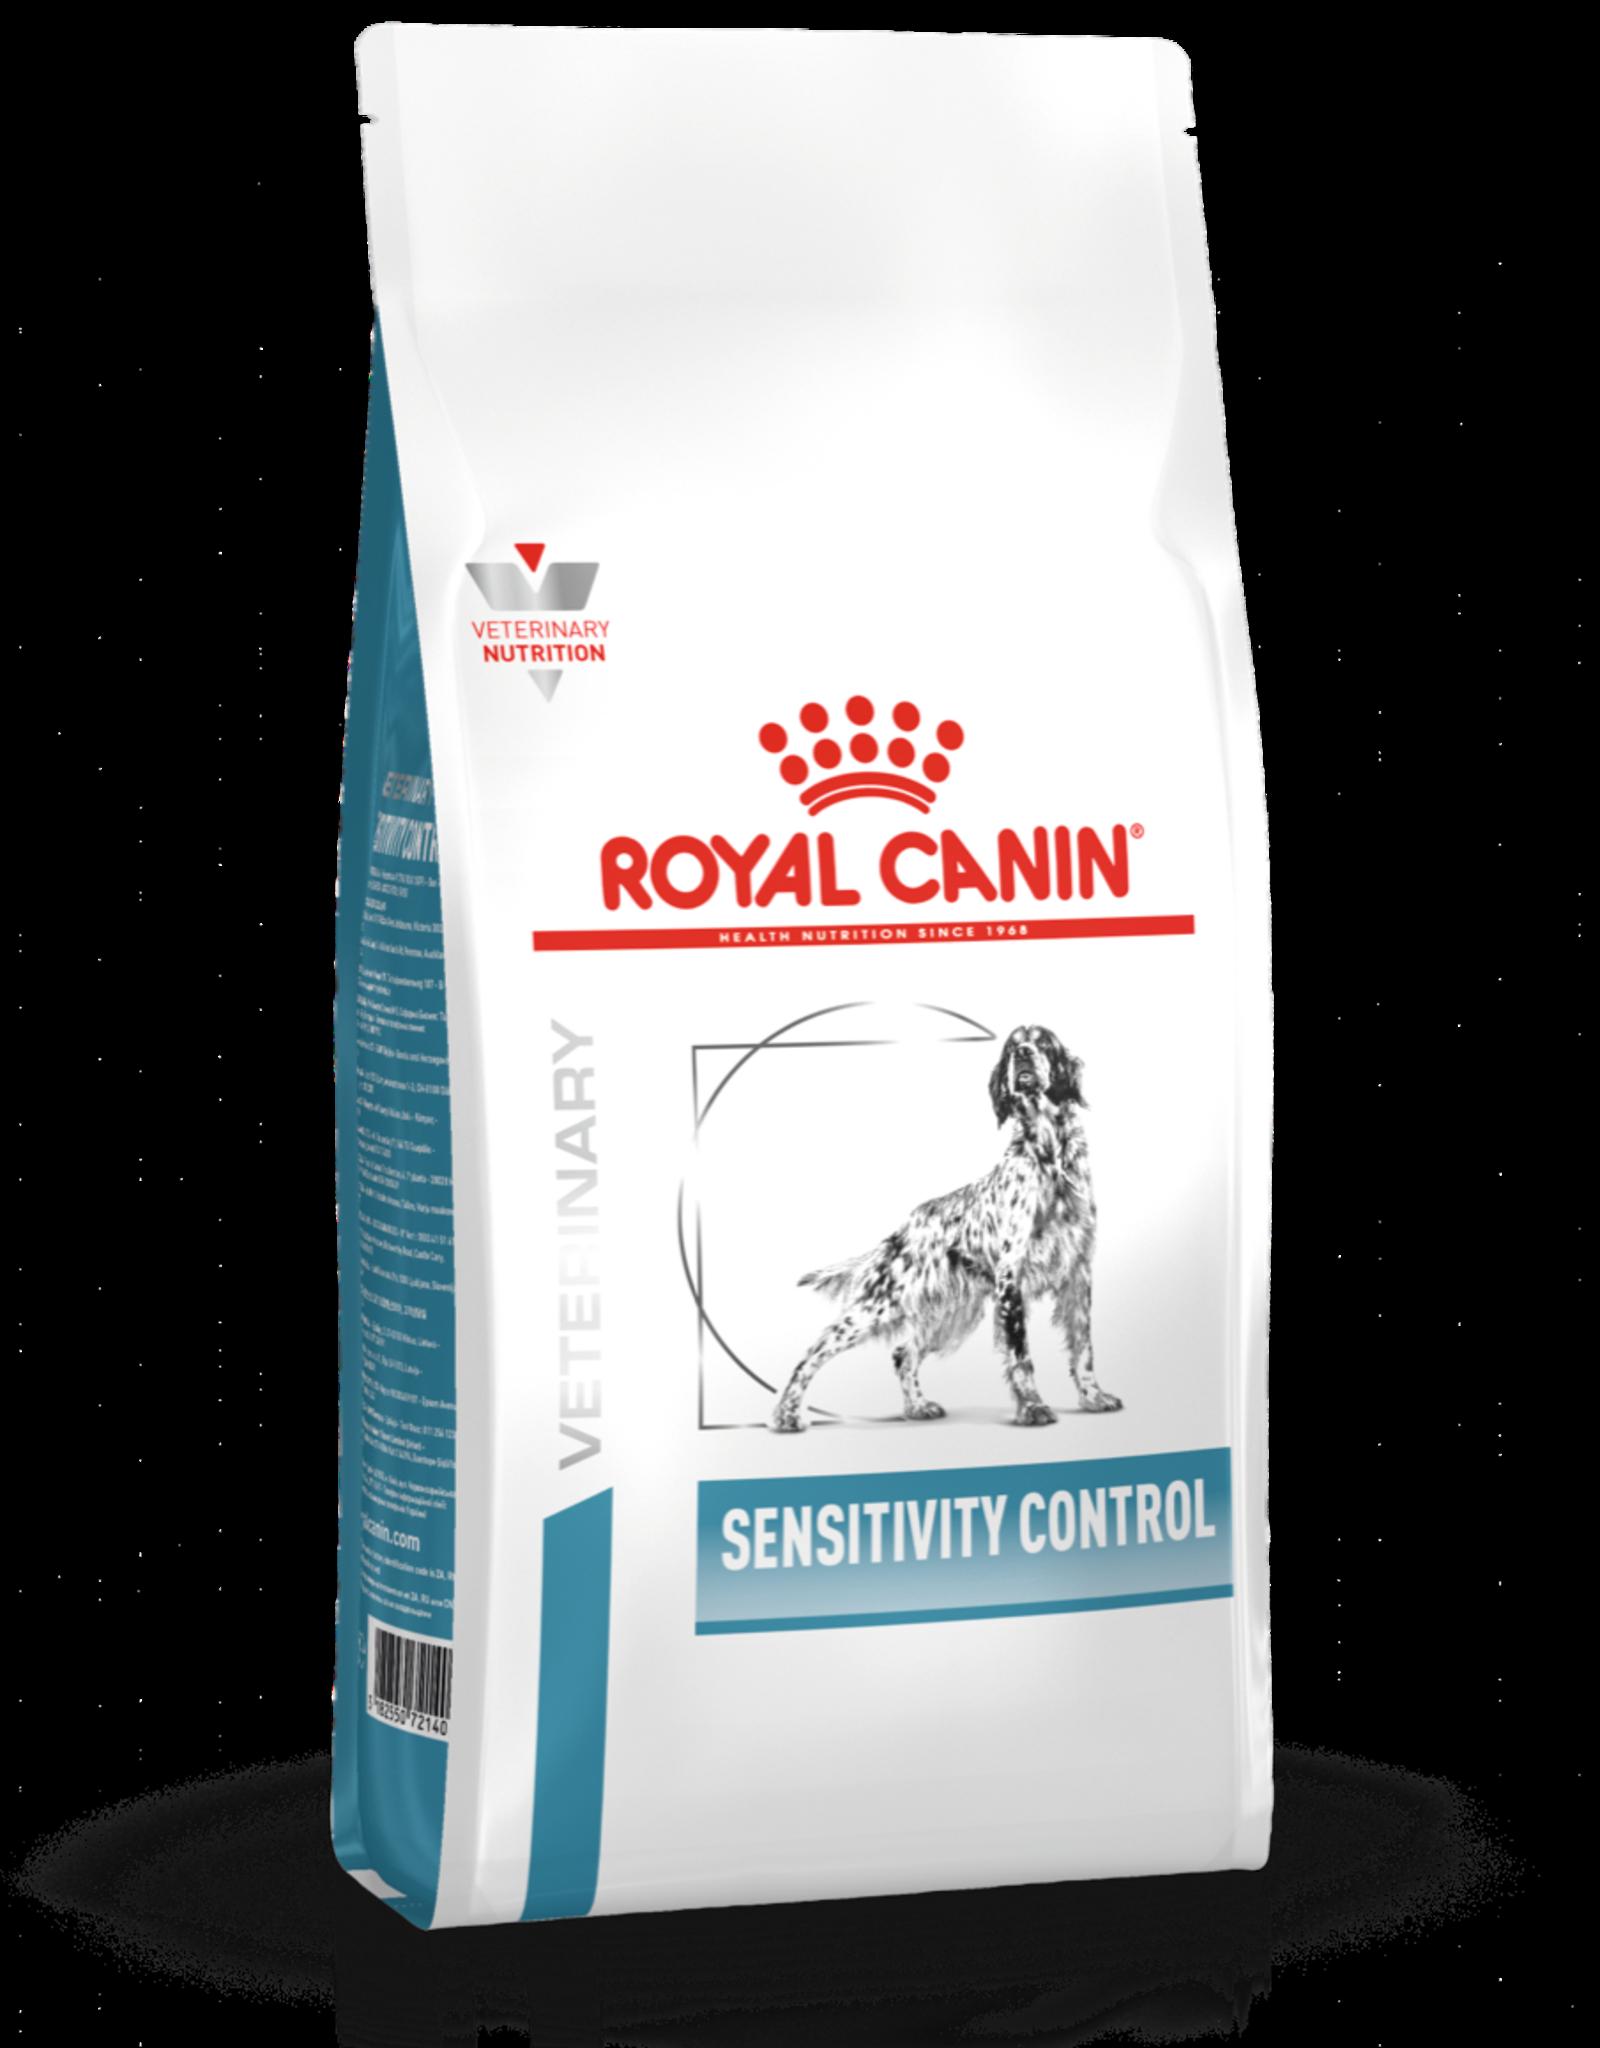 Royal Canin Royal Canin Sensitivity Control Chien Canard 7kg